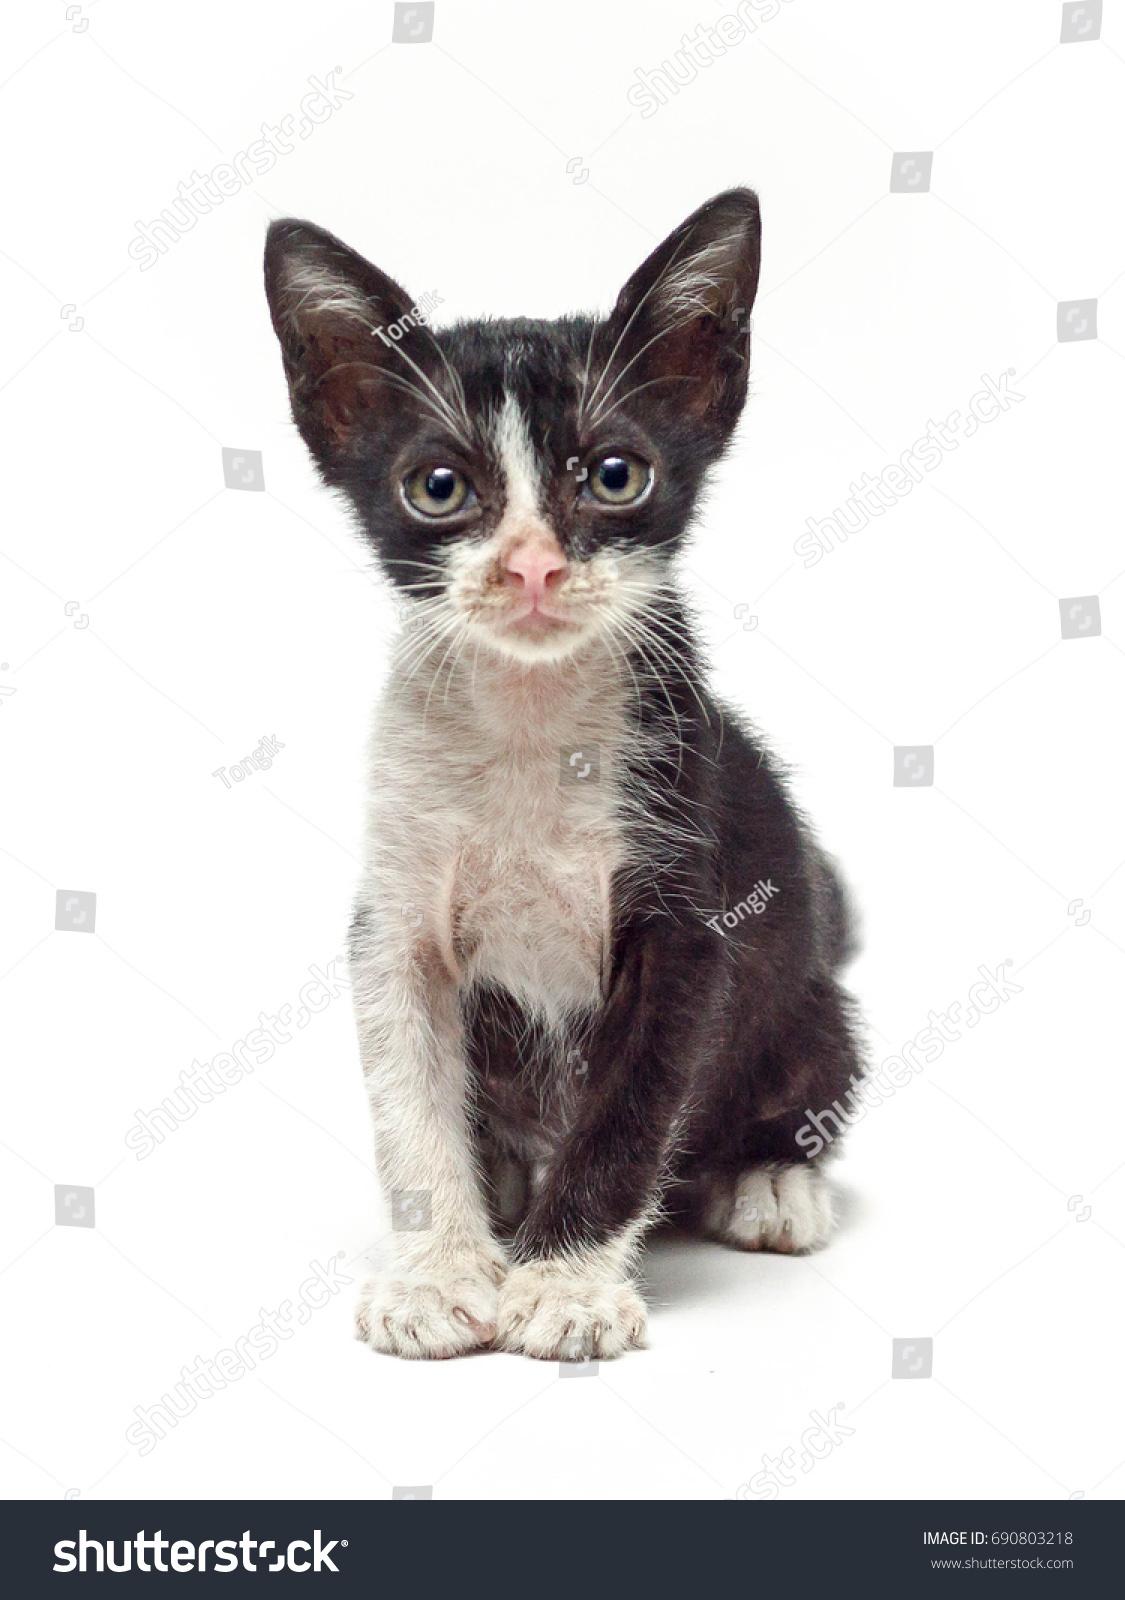 Ugly Black White Kitten Stock Photo Edit Now 690803218